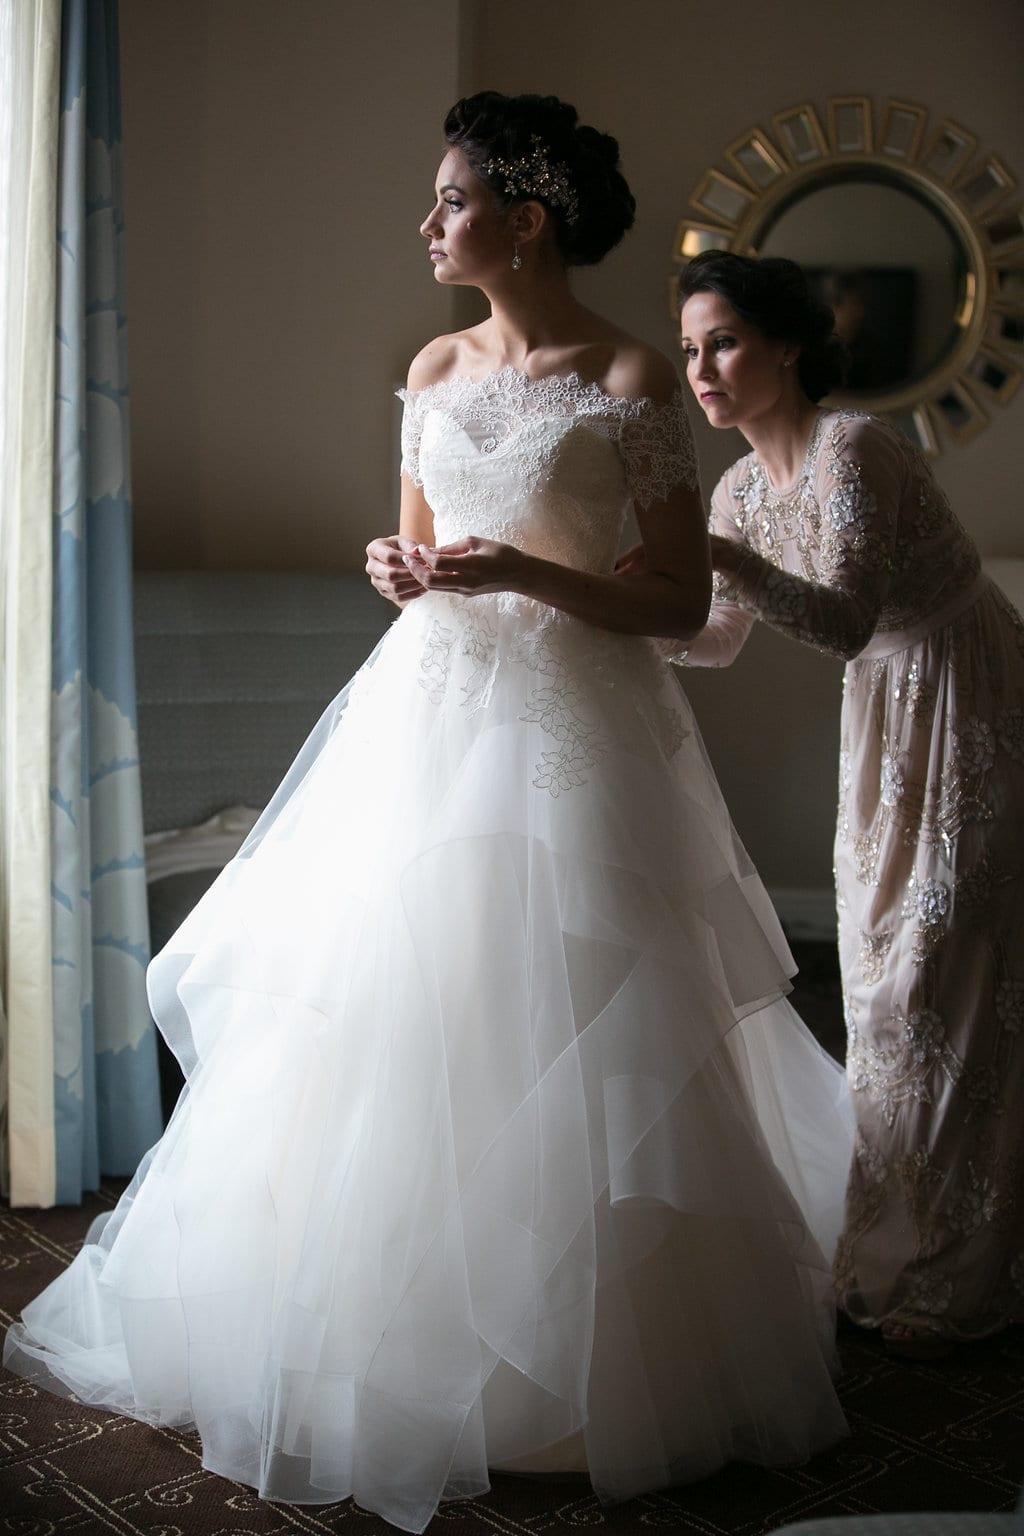 apriljeffwedding 3174 - Premier W.E.D.